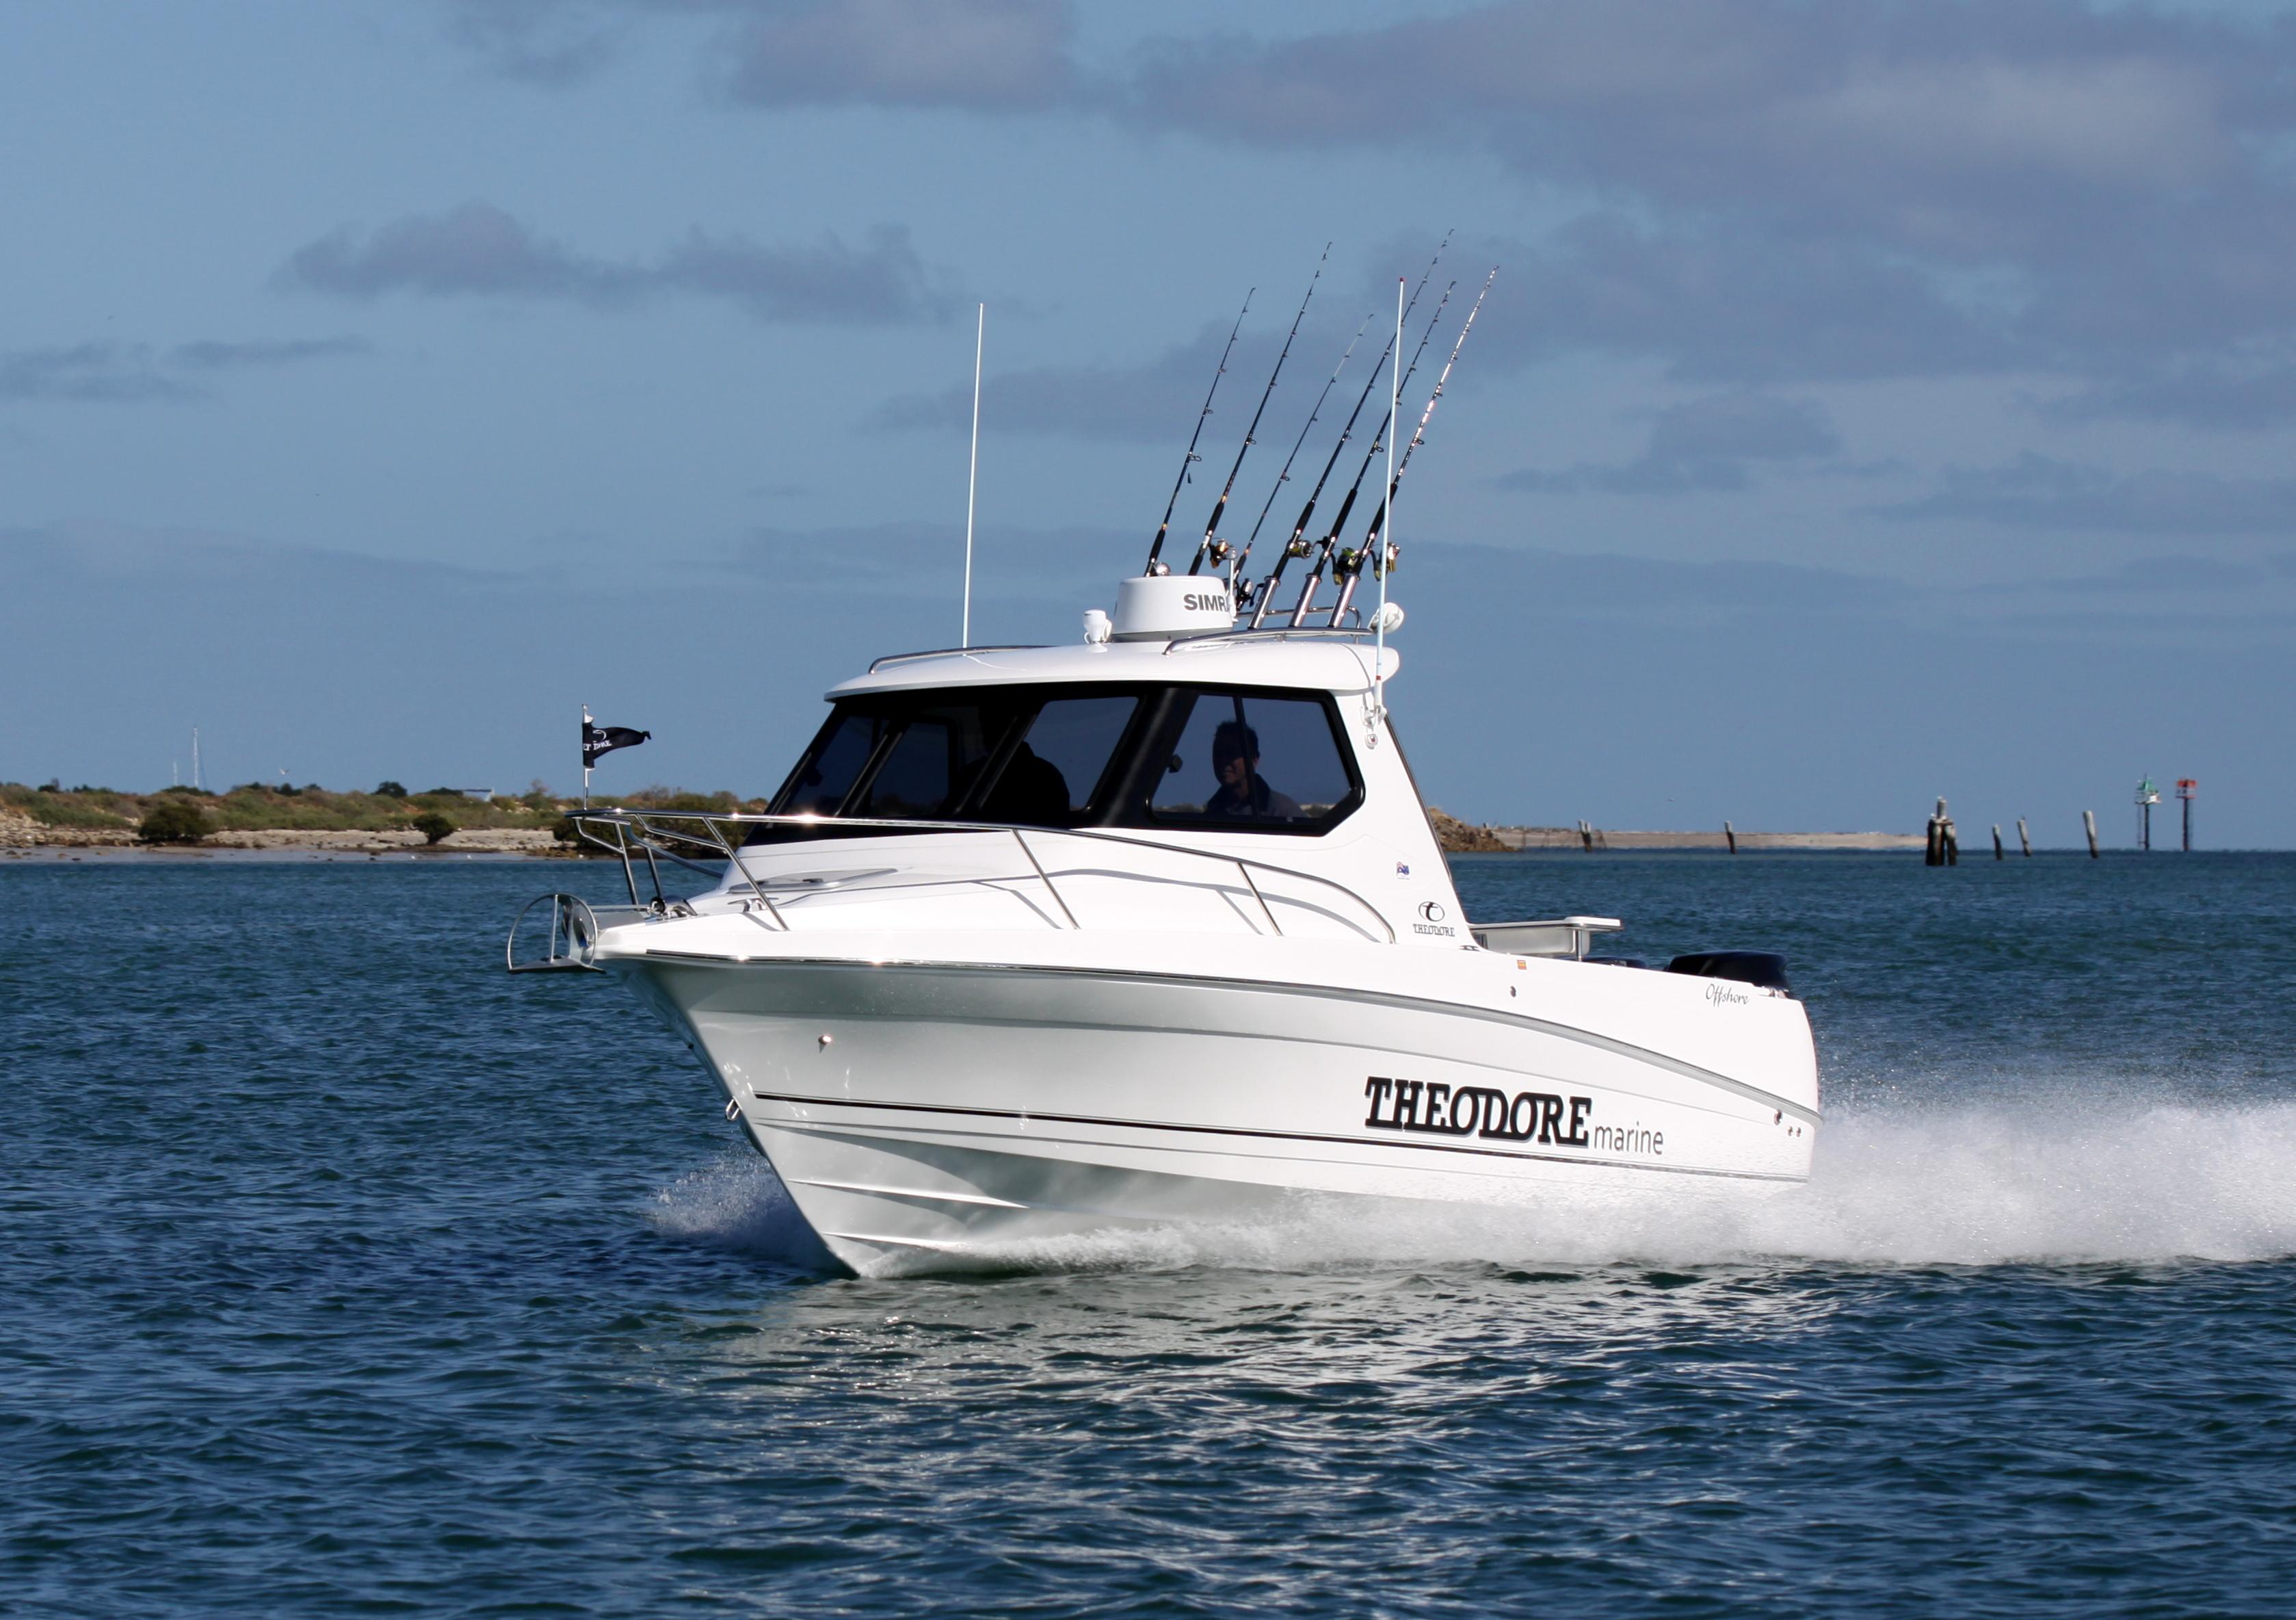 Theodore 720 Offshore Port